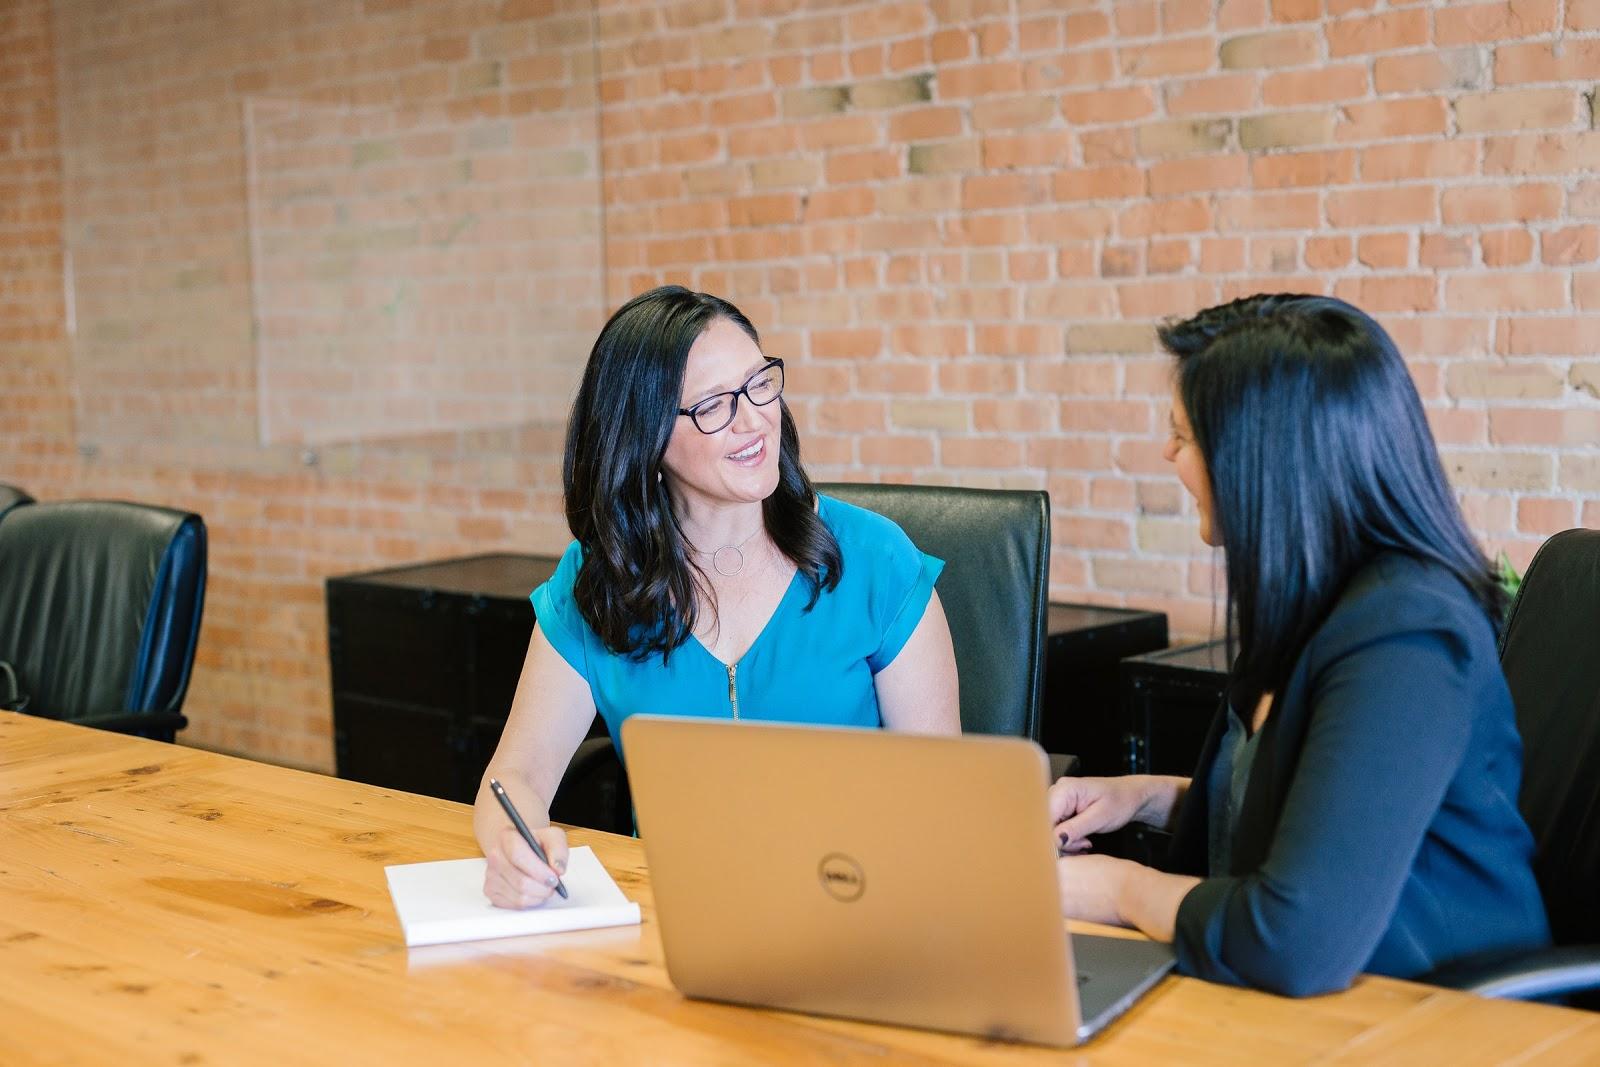 team-building questions